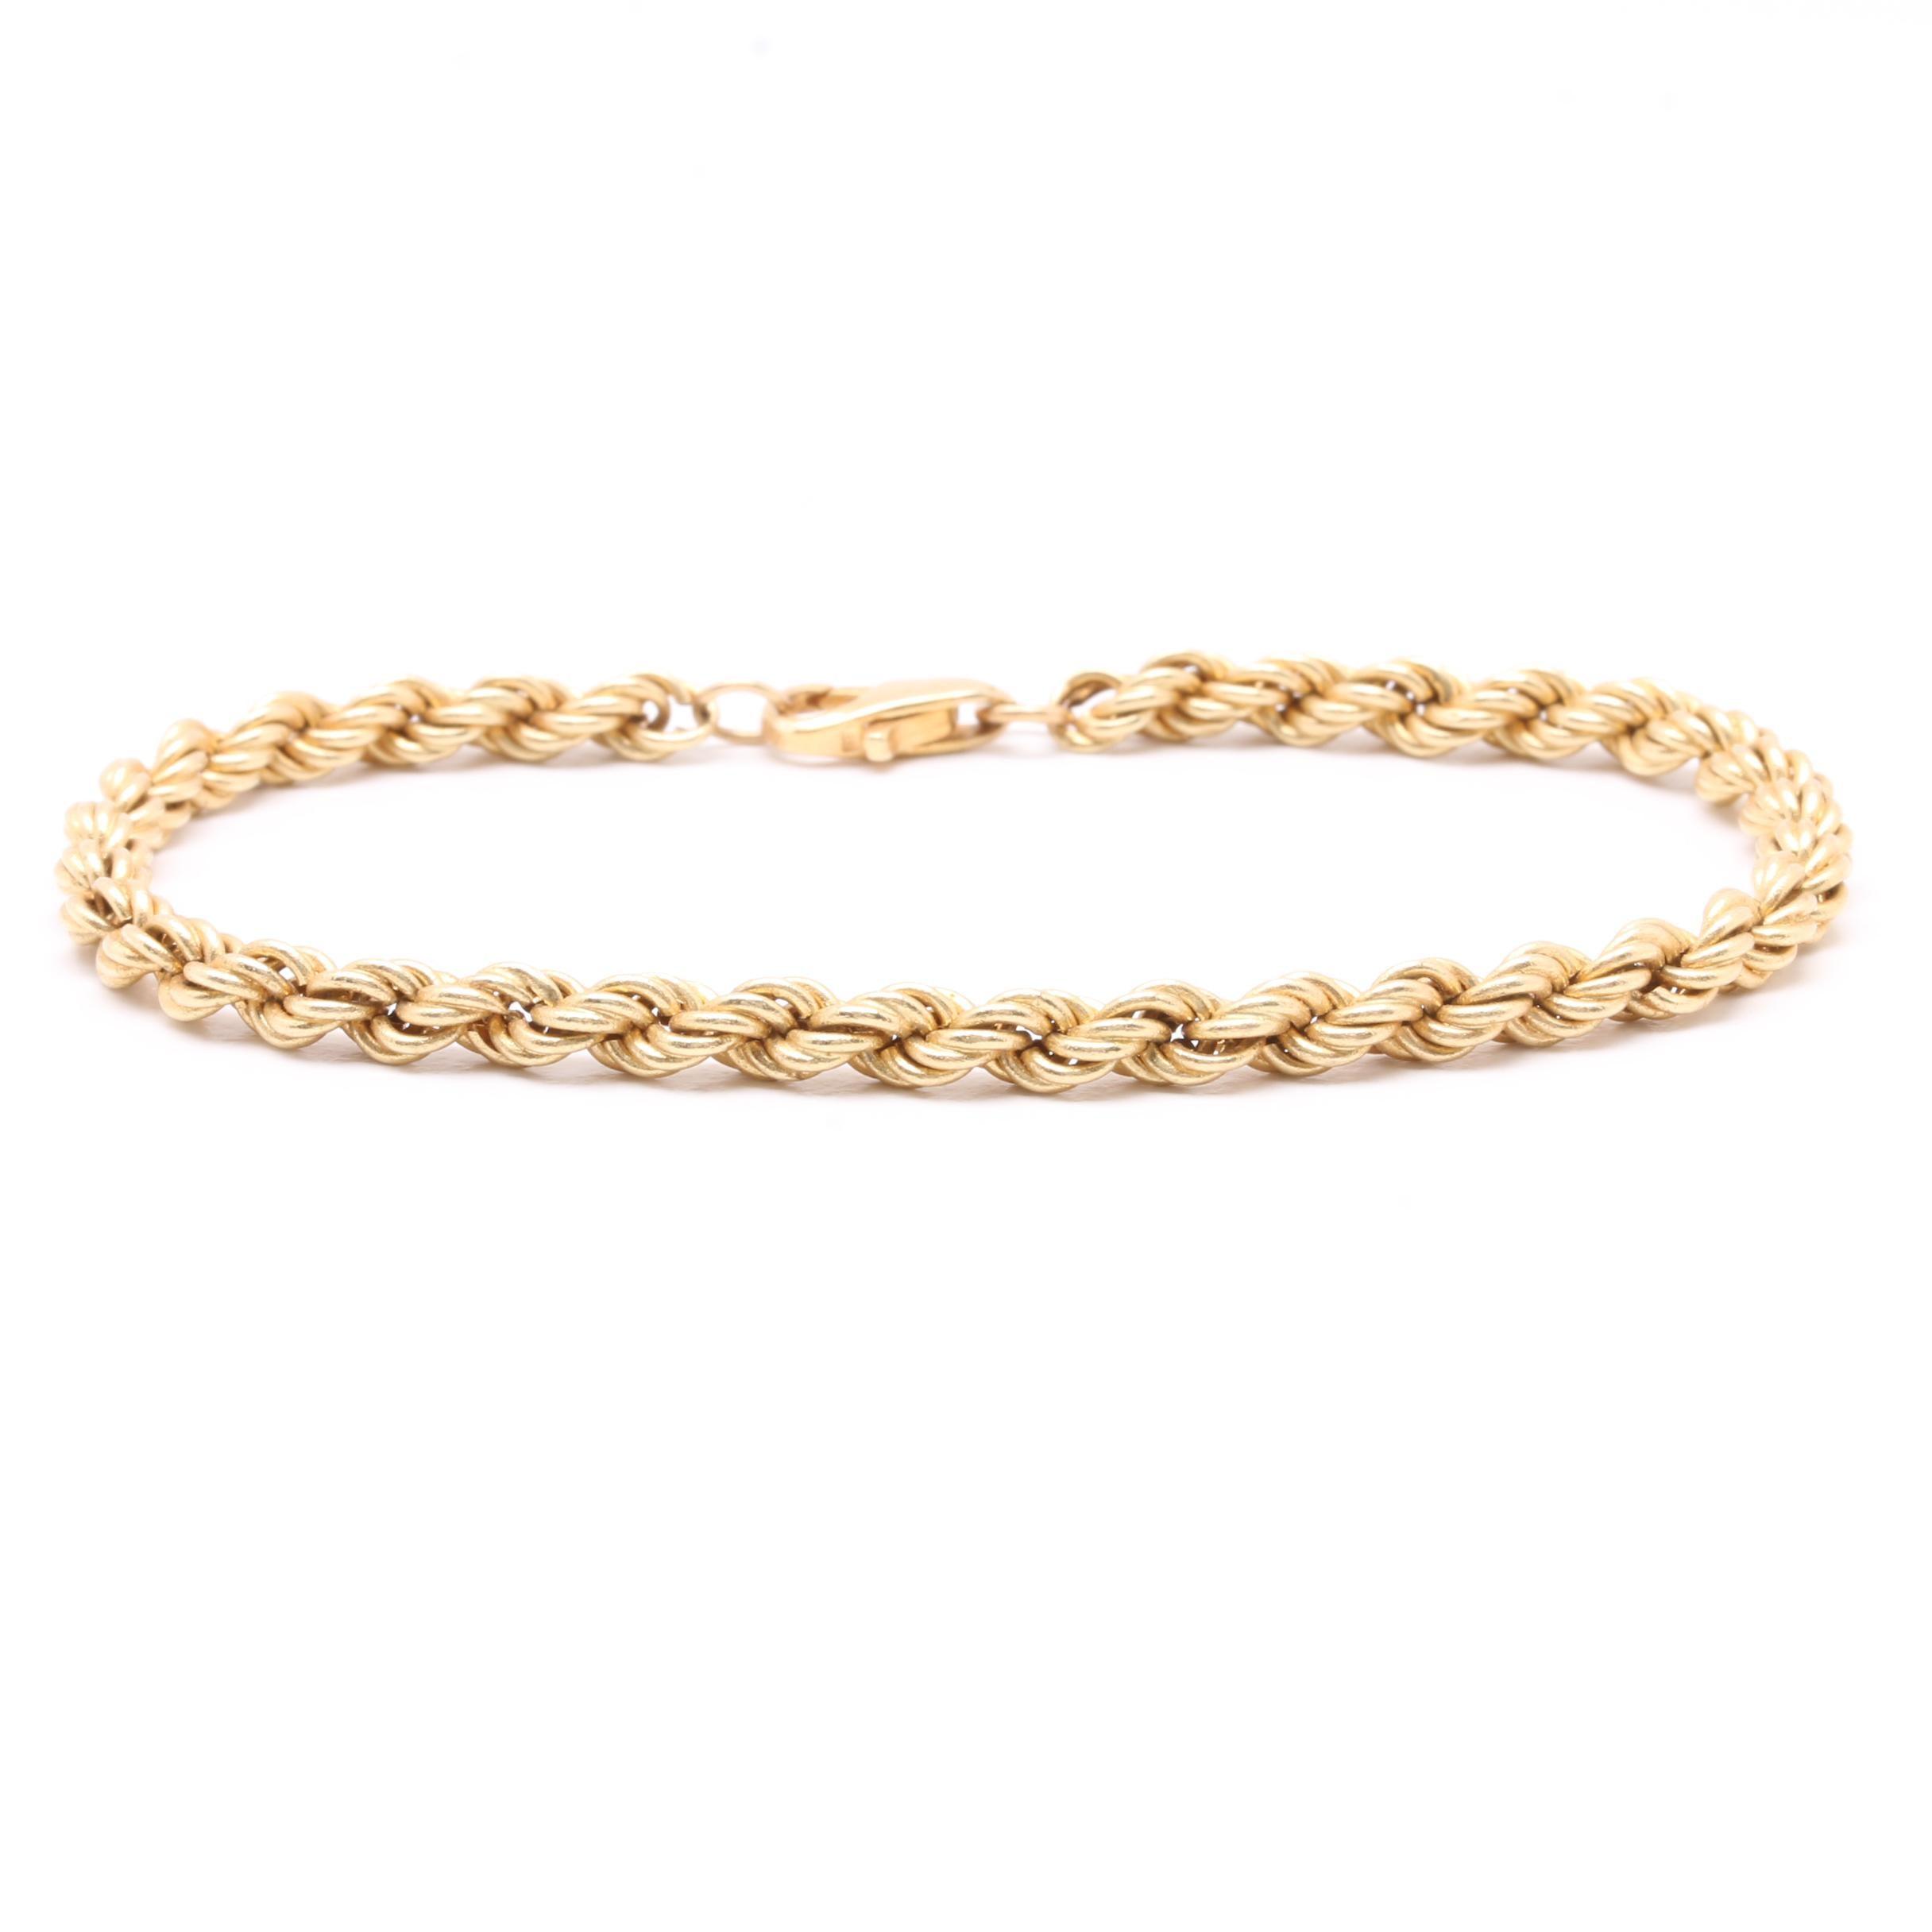 14K Yellow Gold Rope Chain Bracelet